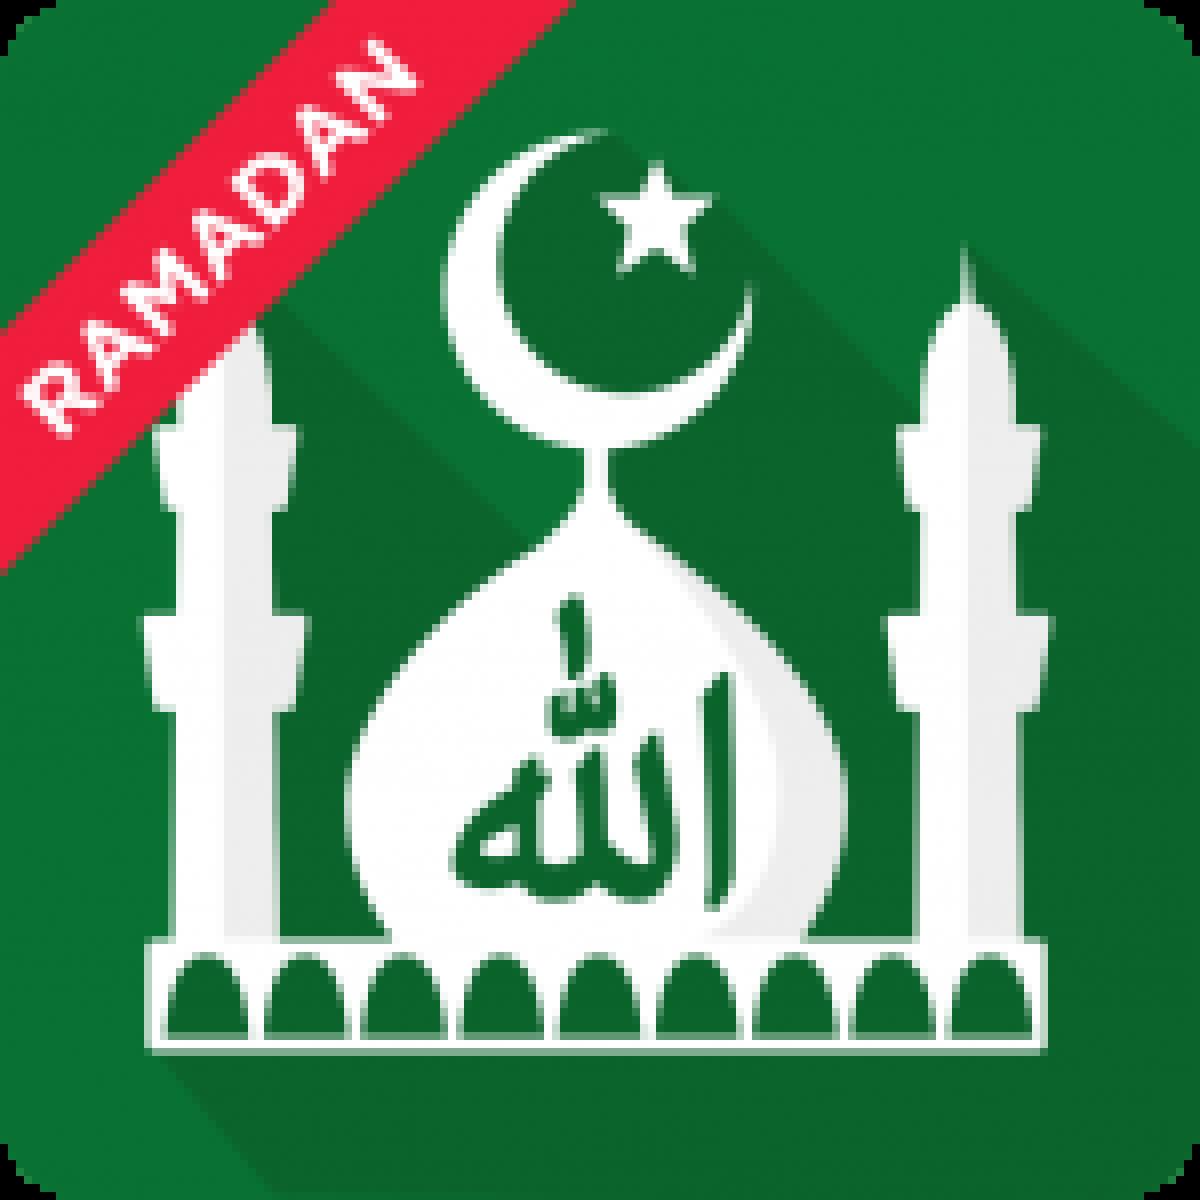 Muslim Pro Mod Apk 11 2 11 Download Premium Unlocked For Android Mod apk download games, download the latest mod apk games, hack mod apk free here. muslim pro mod apk 11 2 11 download